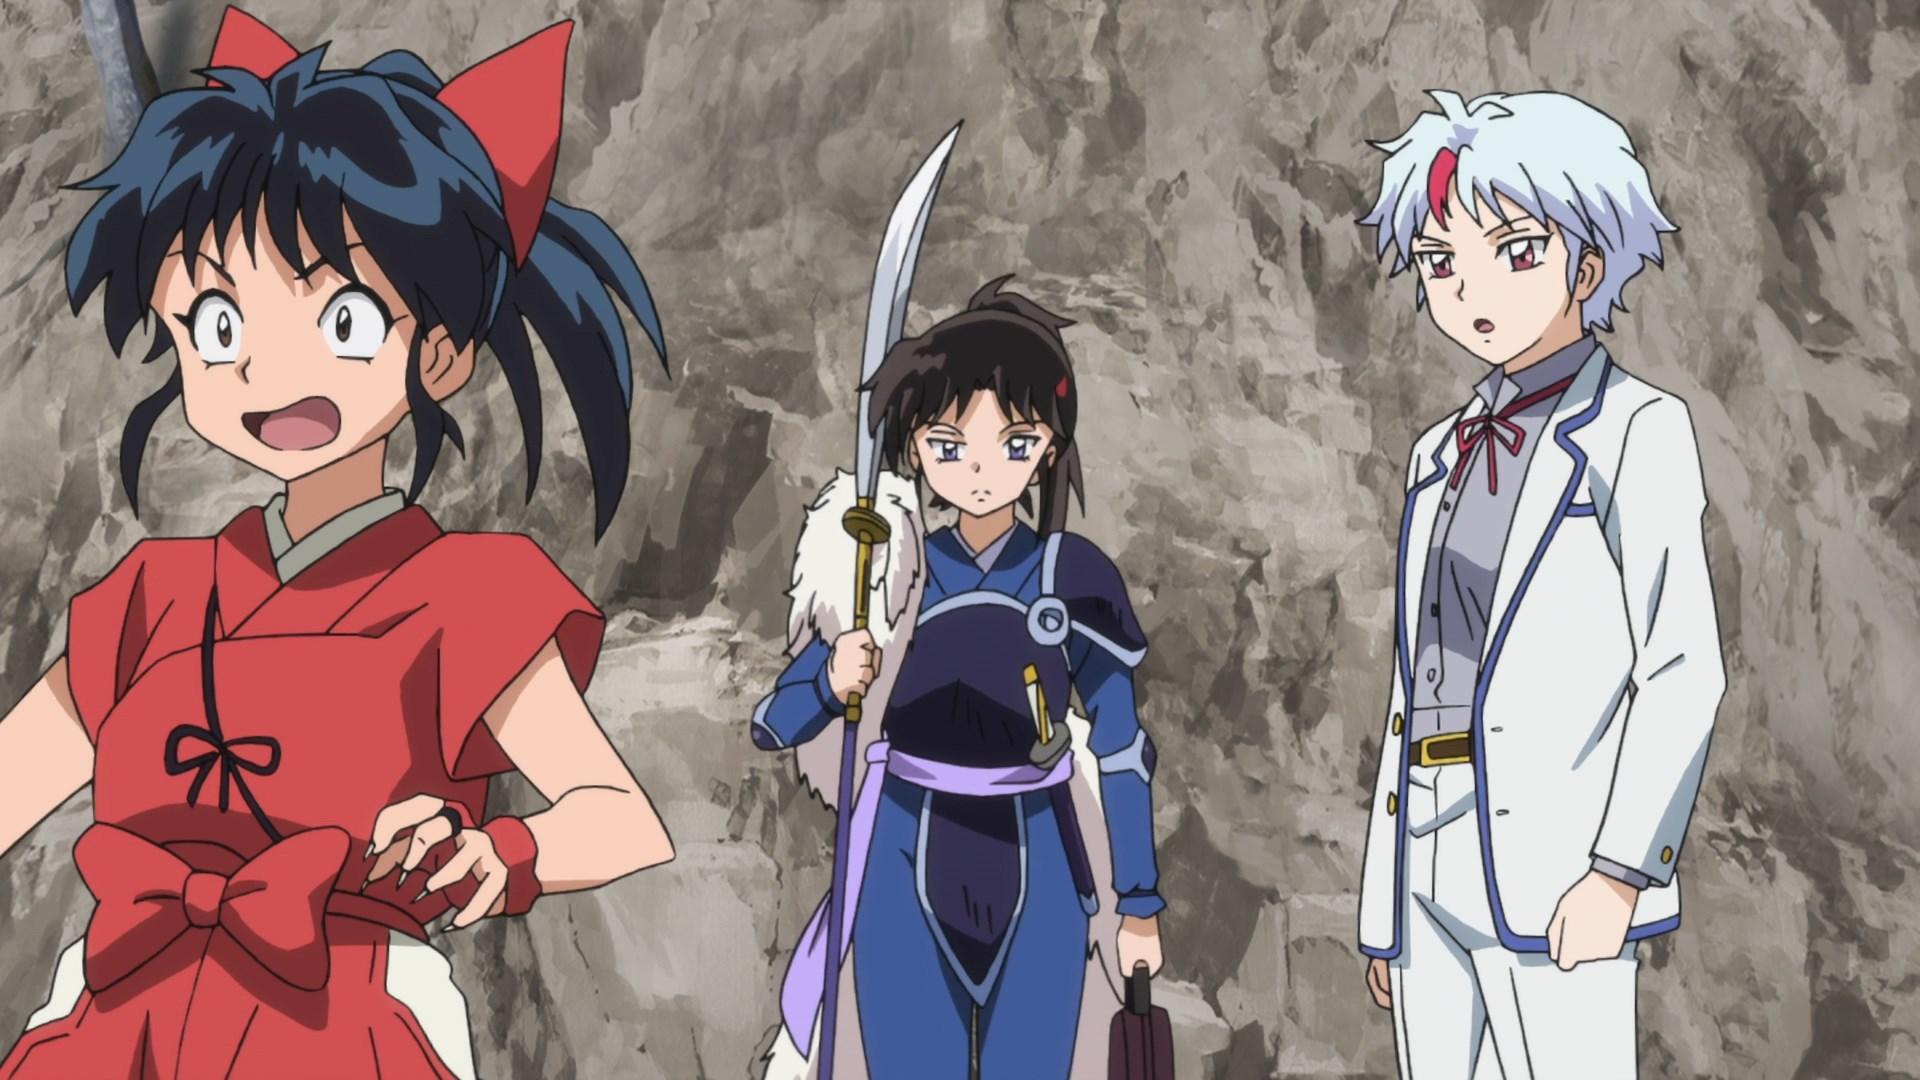 Featured image for Yashahime: Princess Half-Demon 11 (Forced Bonding)